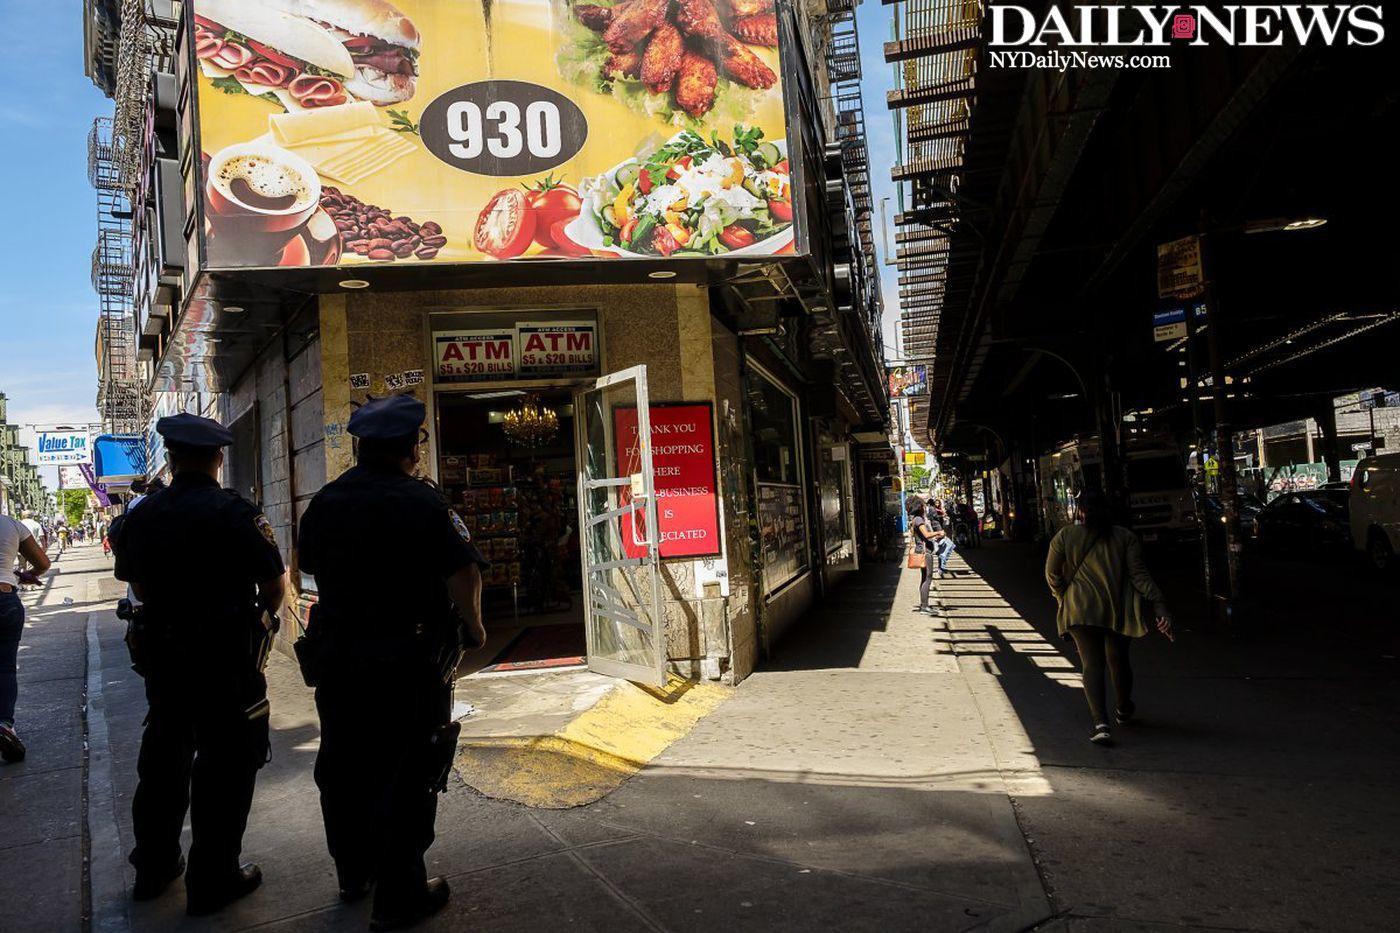 Brooklyn businesses reopen after a slew of K2 overdoses despite closure requests https://t.co/Da3sJCaKcj https://t.co/im734bLoHt